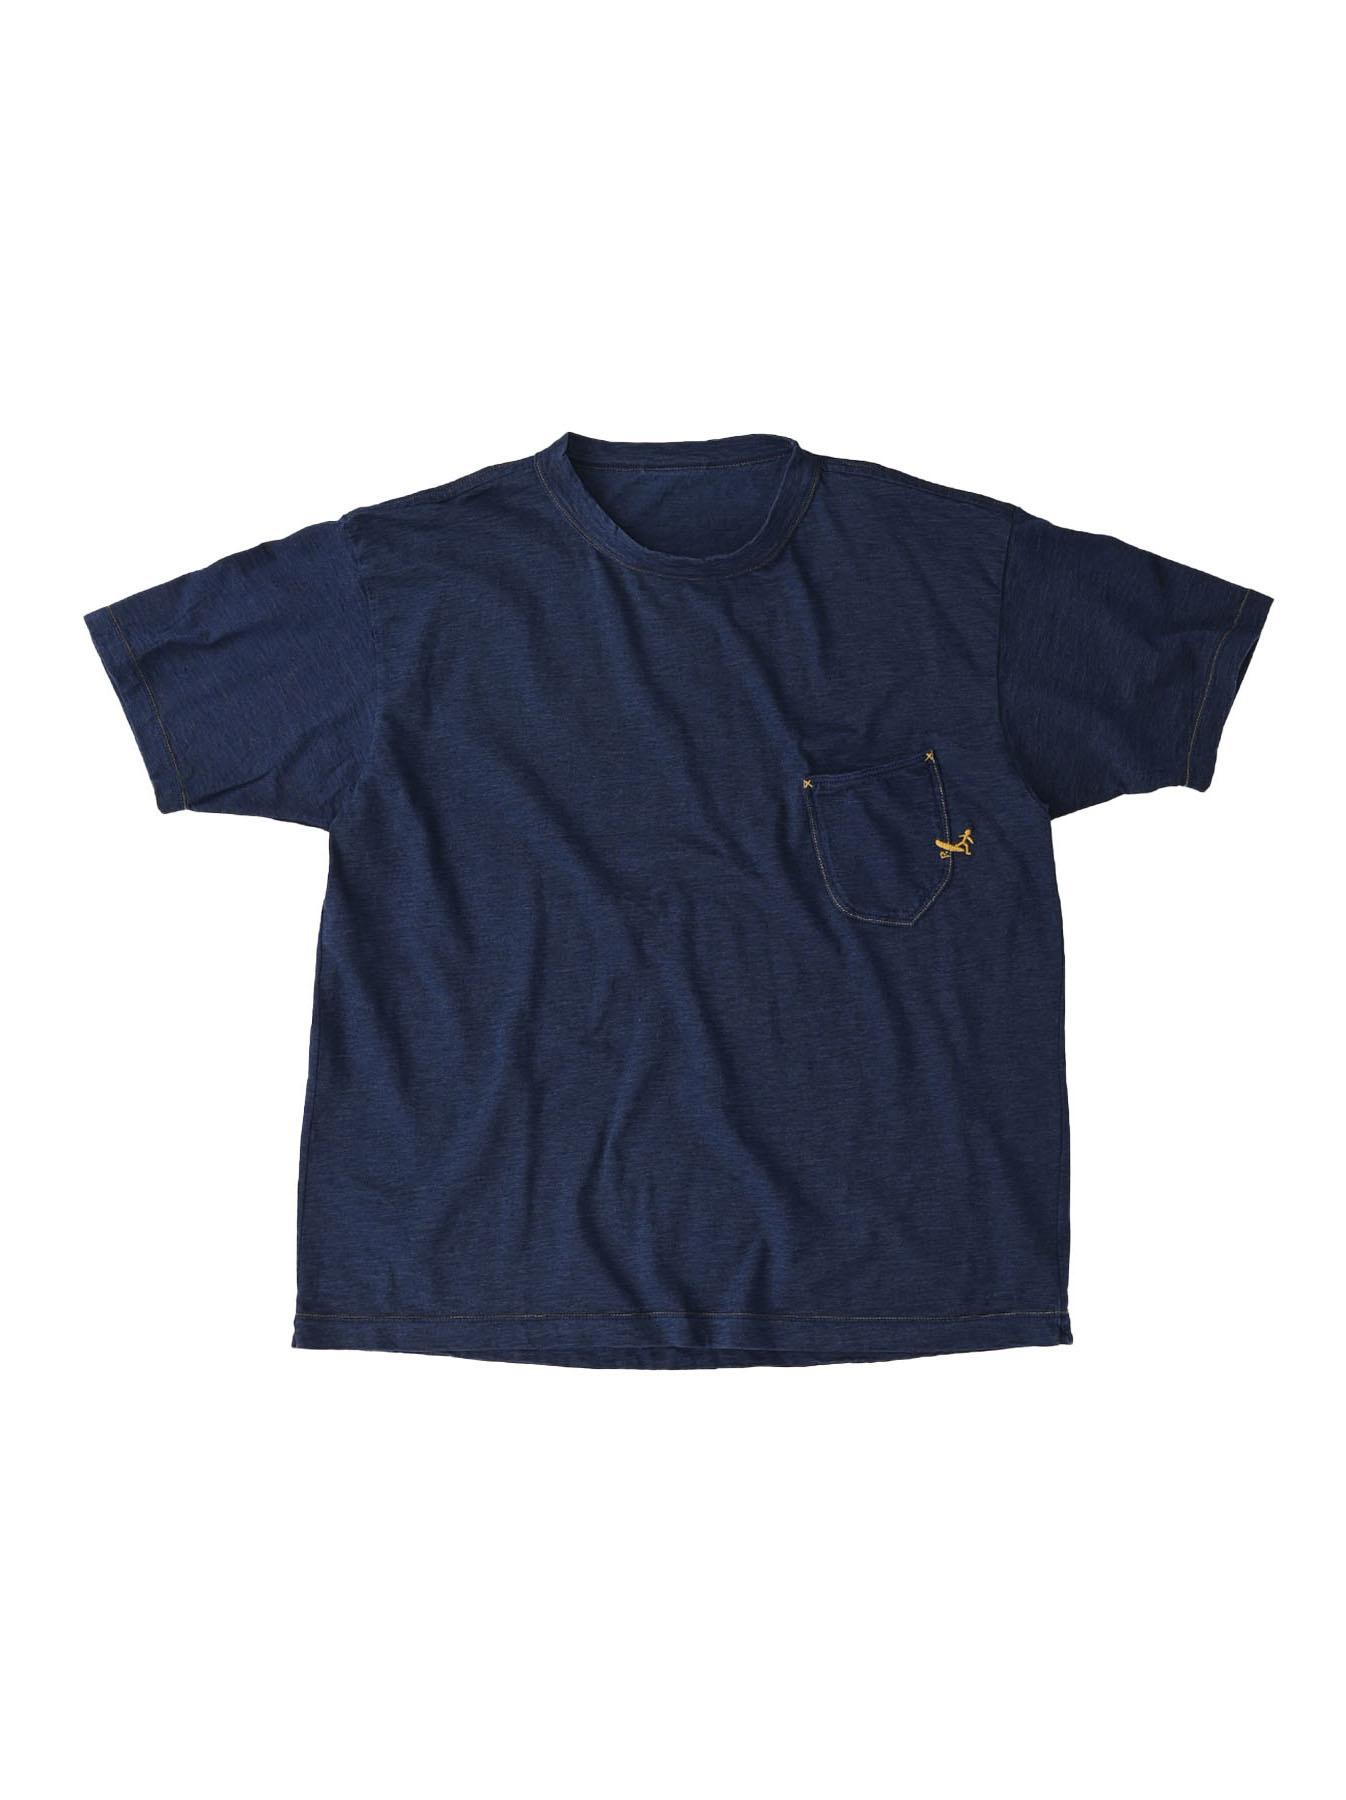 Indigo Hayama-kun Embroidered 908 Ocean T-shirt (0621)-1